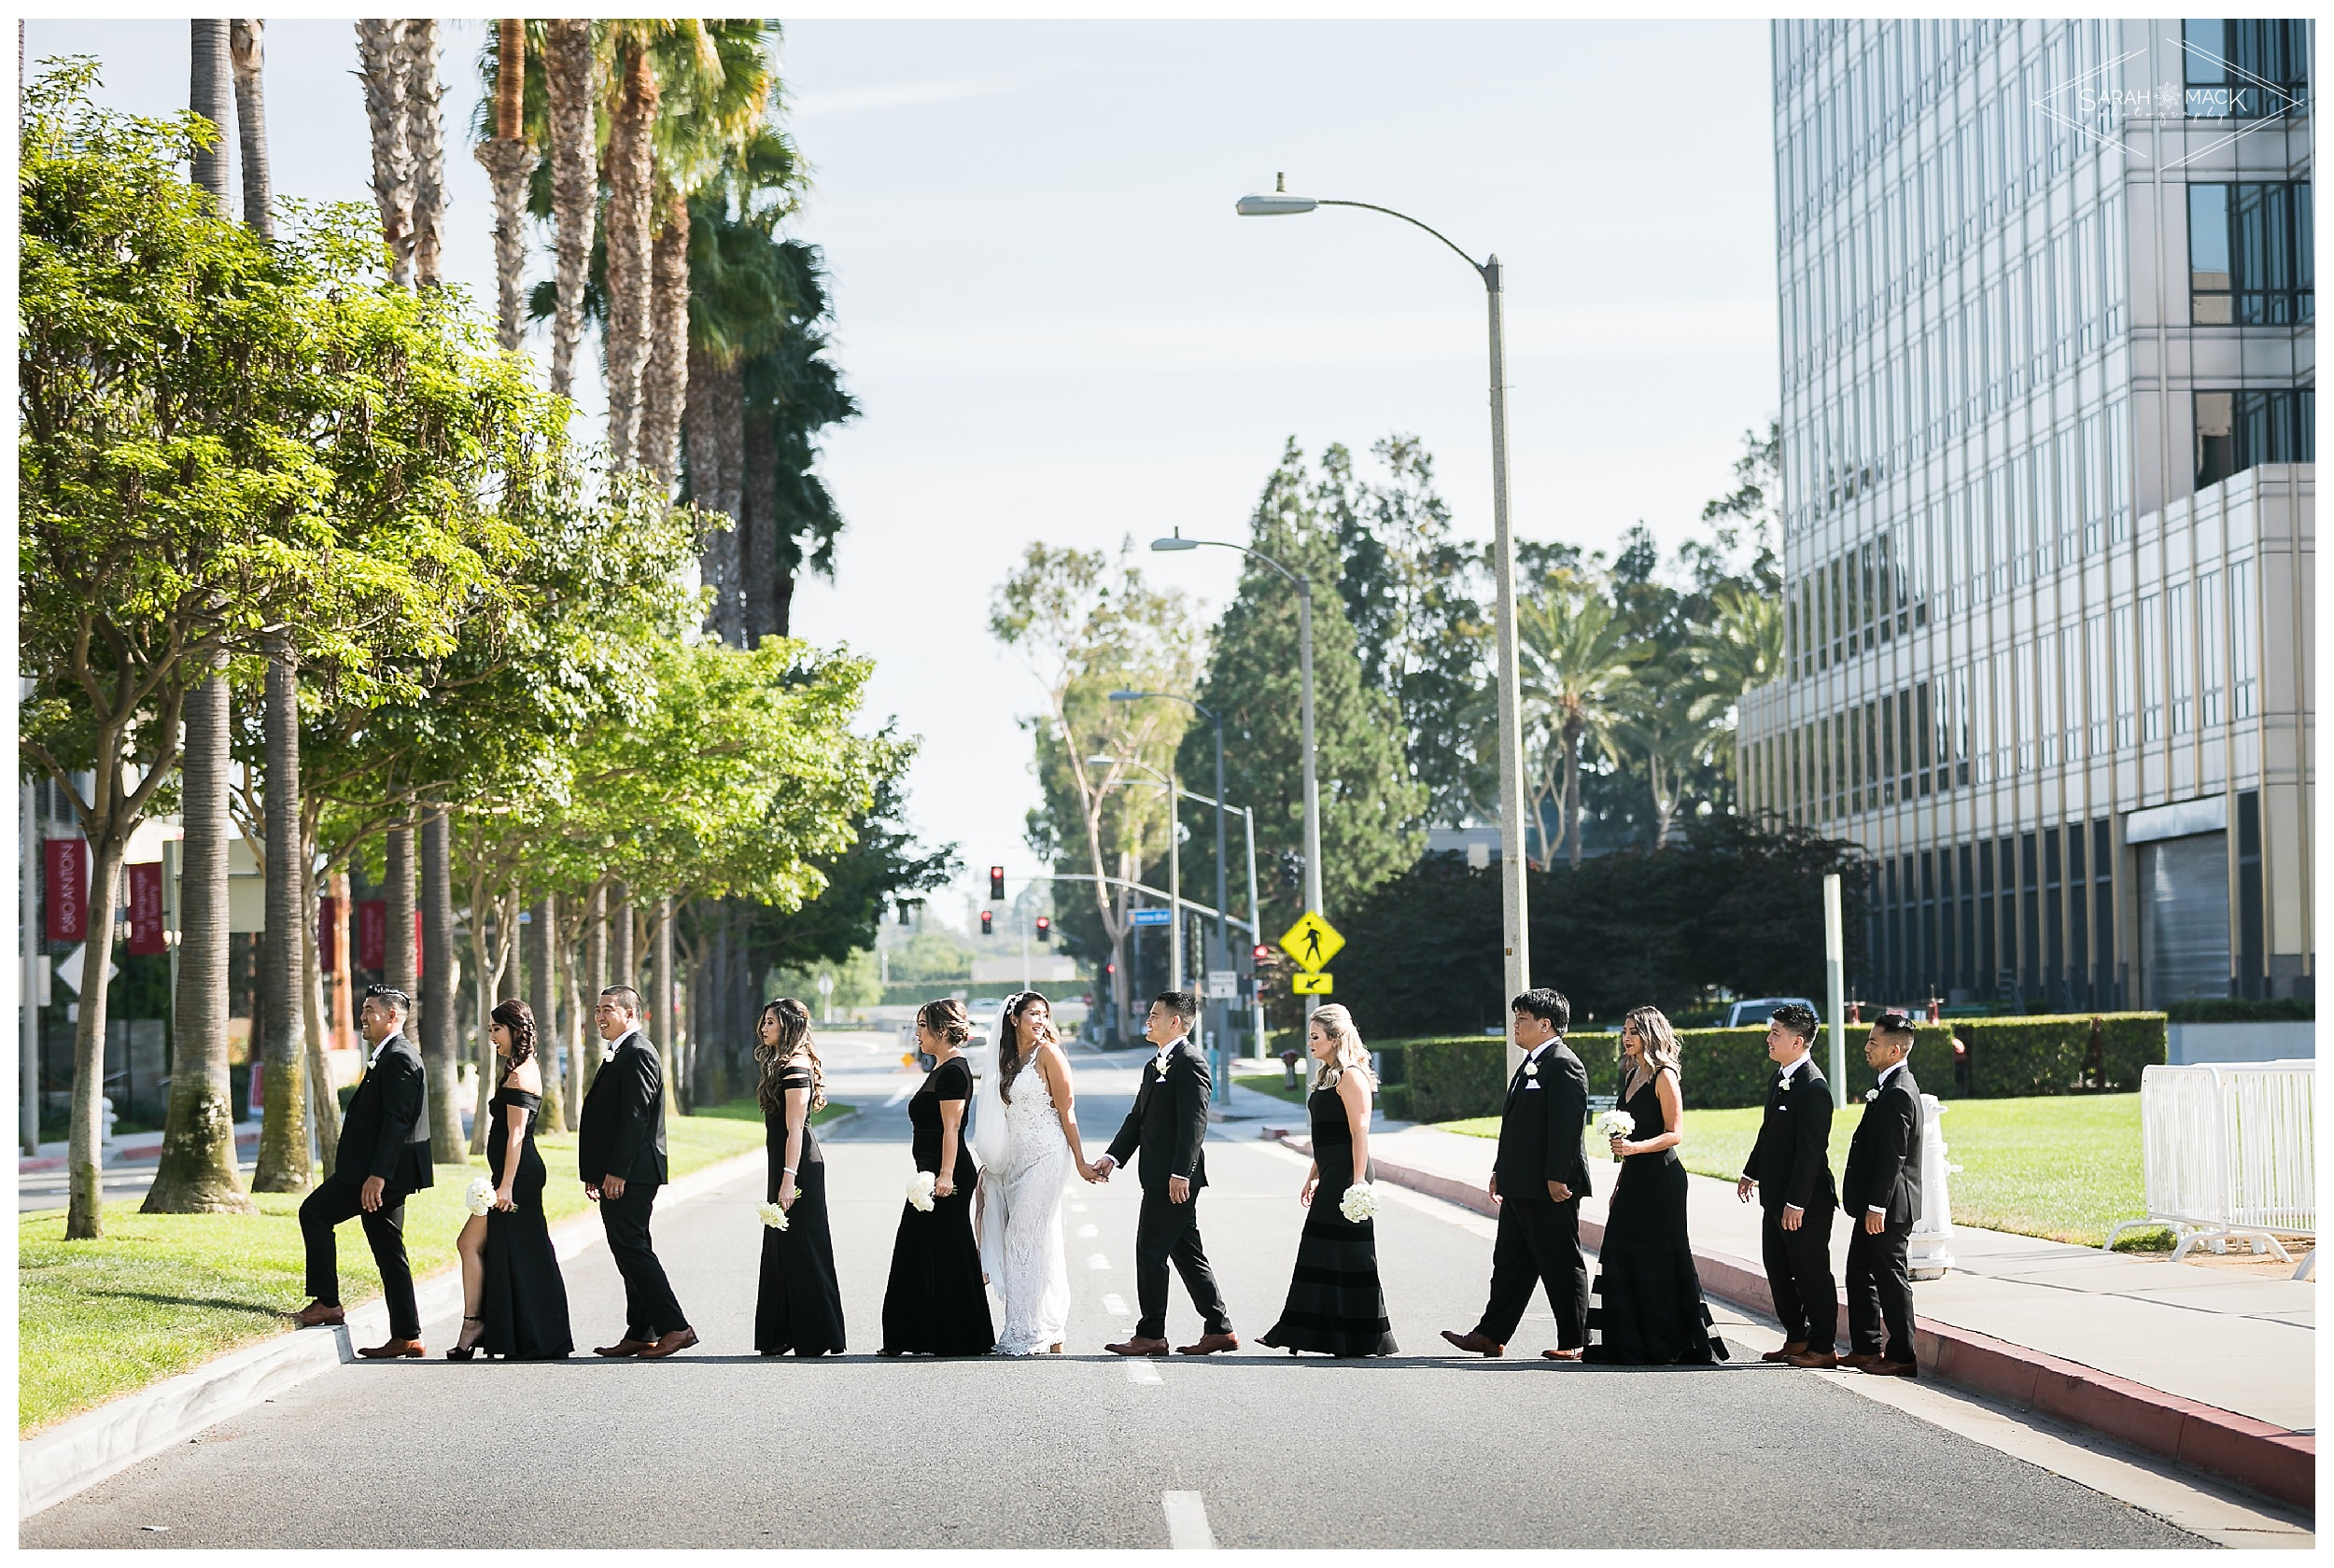 LE-Avenue-of-the-Arts-Costa-Mesa-Wedding-Photography-0130.jpg